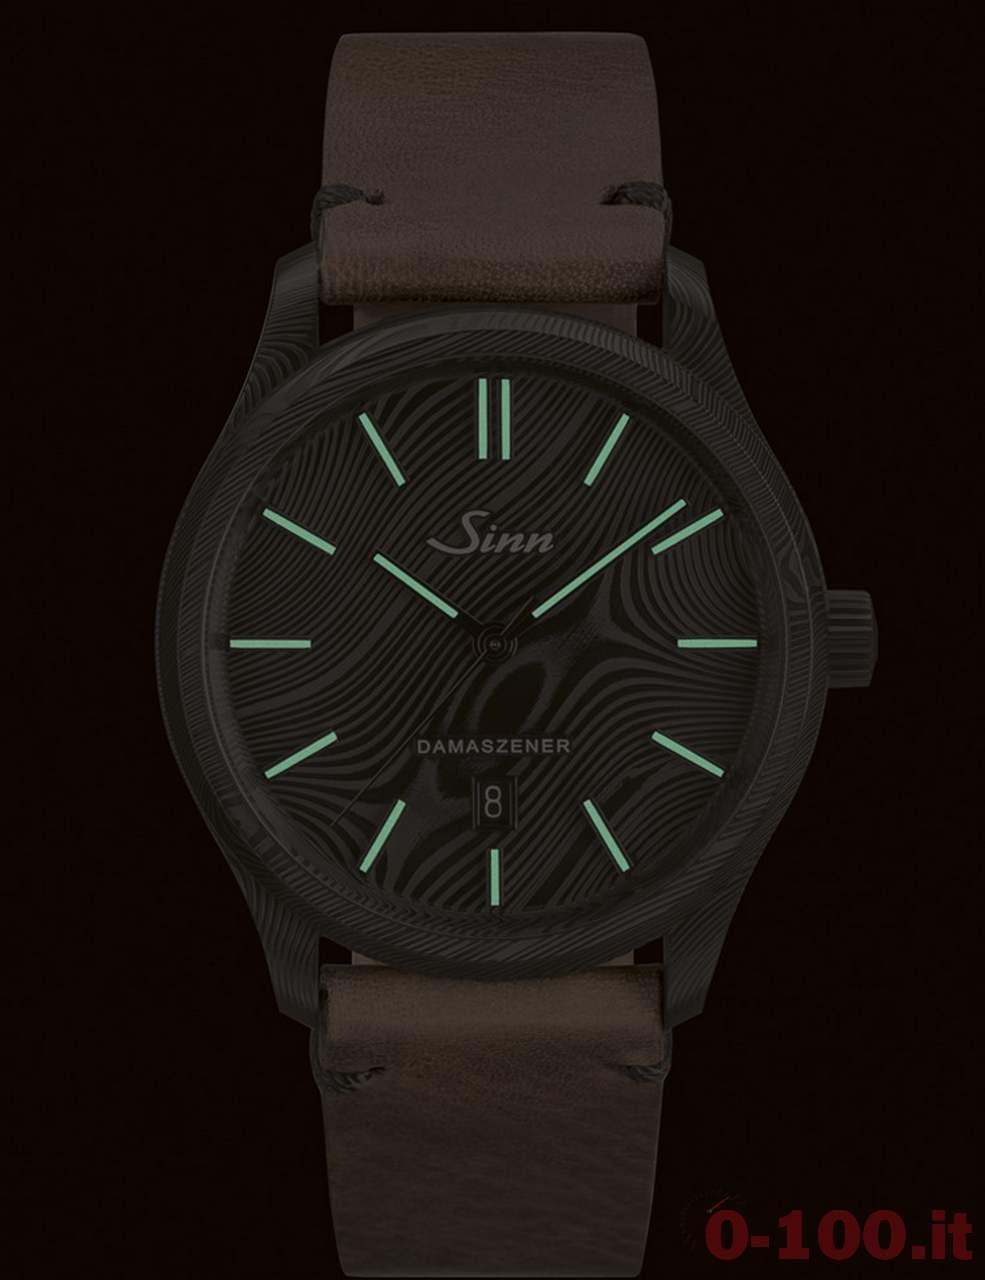 sinn-1800-s-damaszener-limited-edition-prezzo-price_0-1006